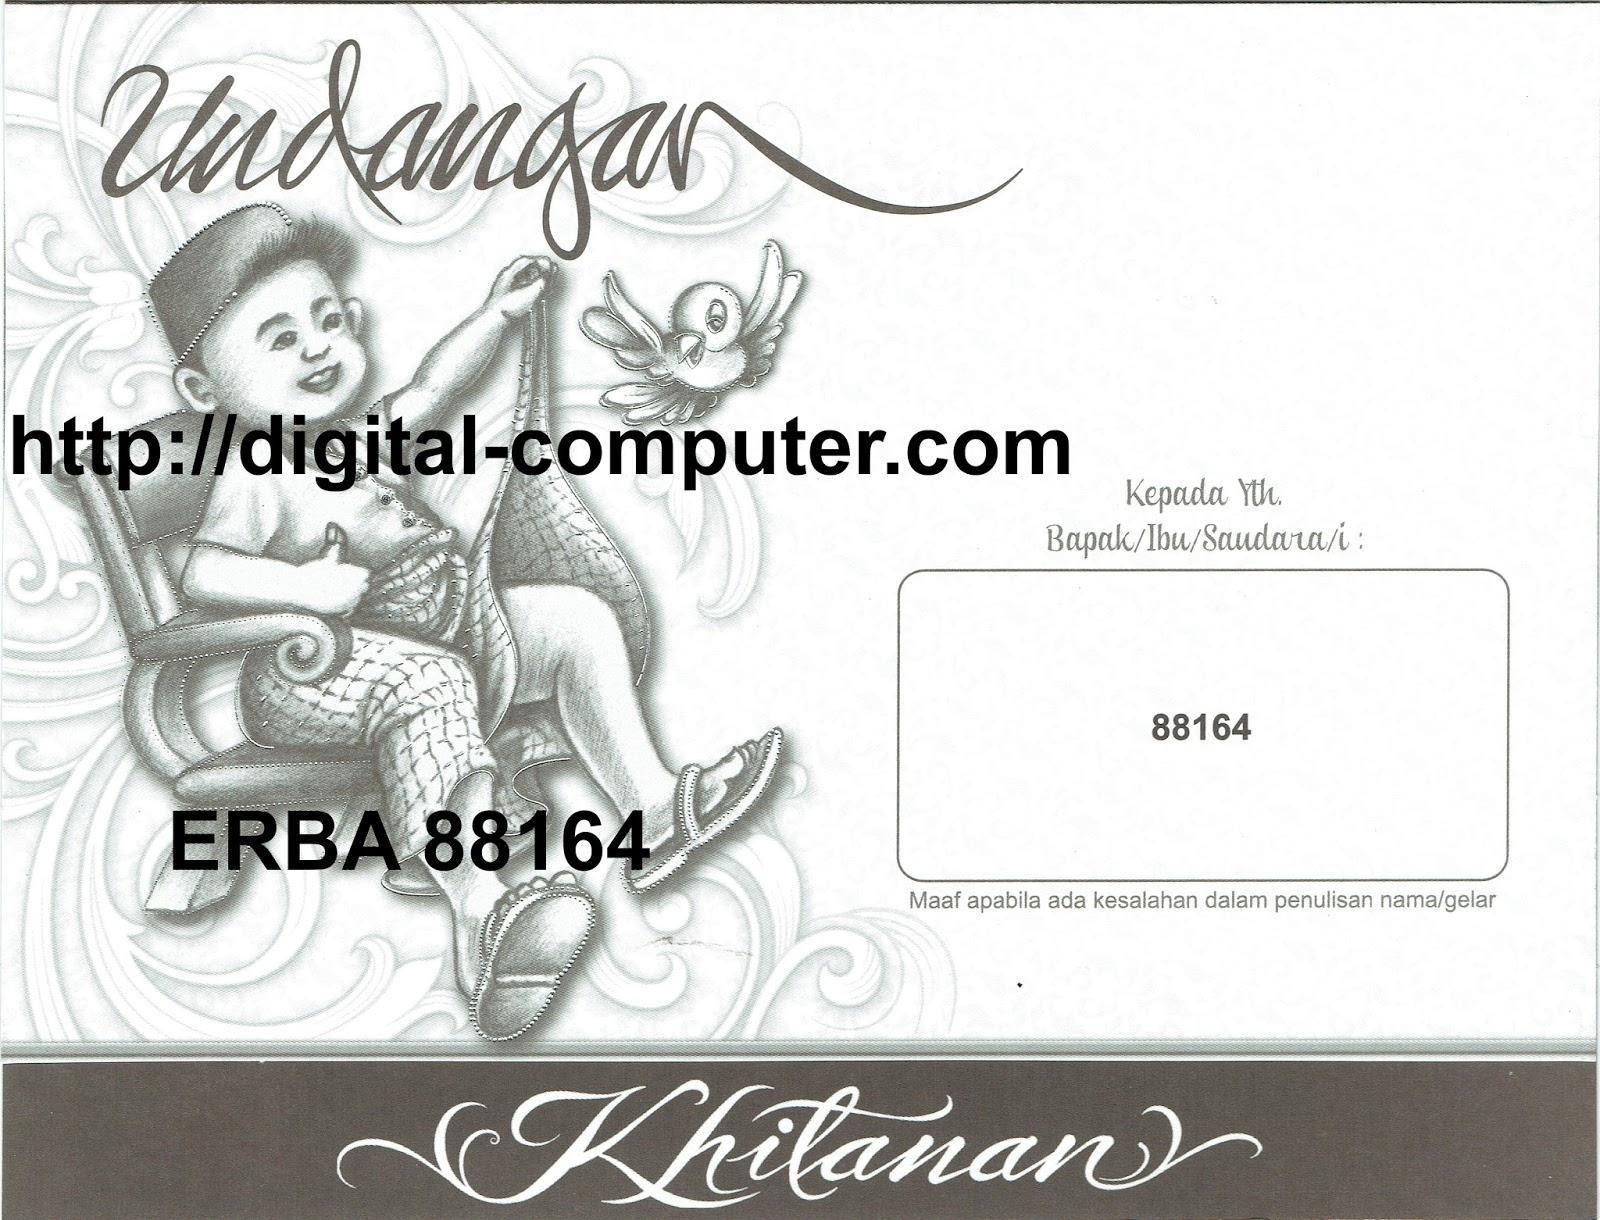 Undangan Softcover ERBA 88164